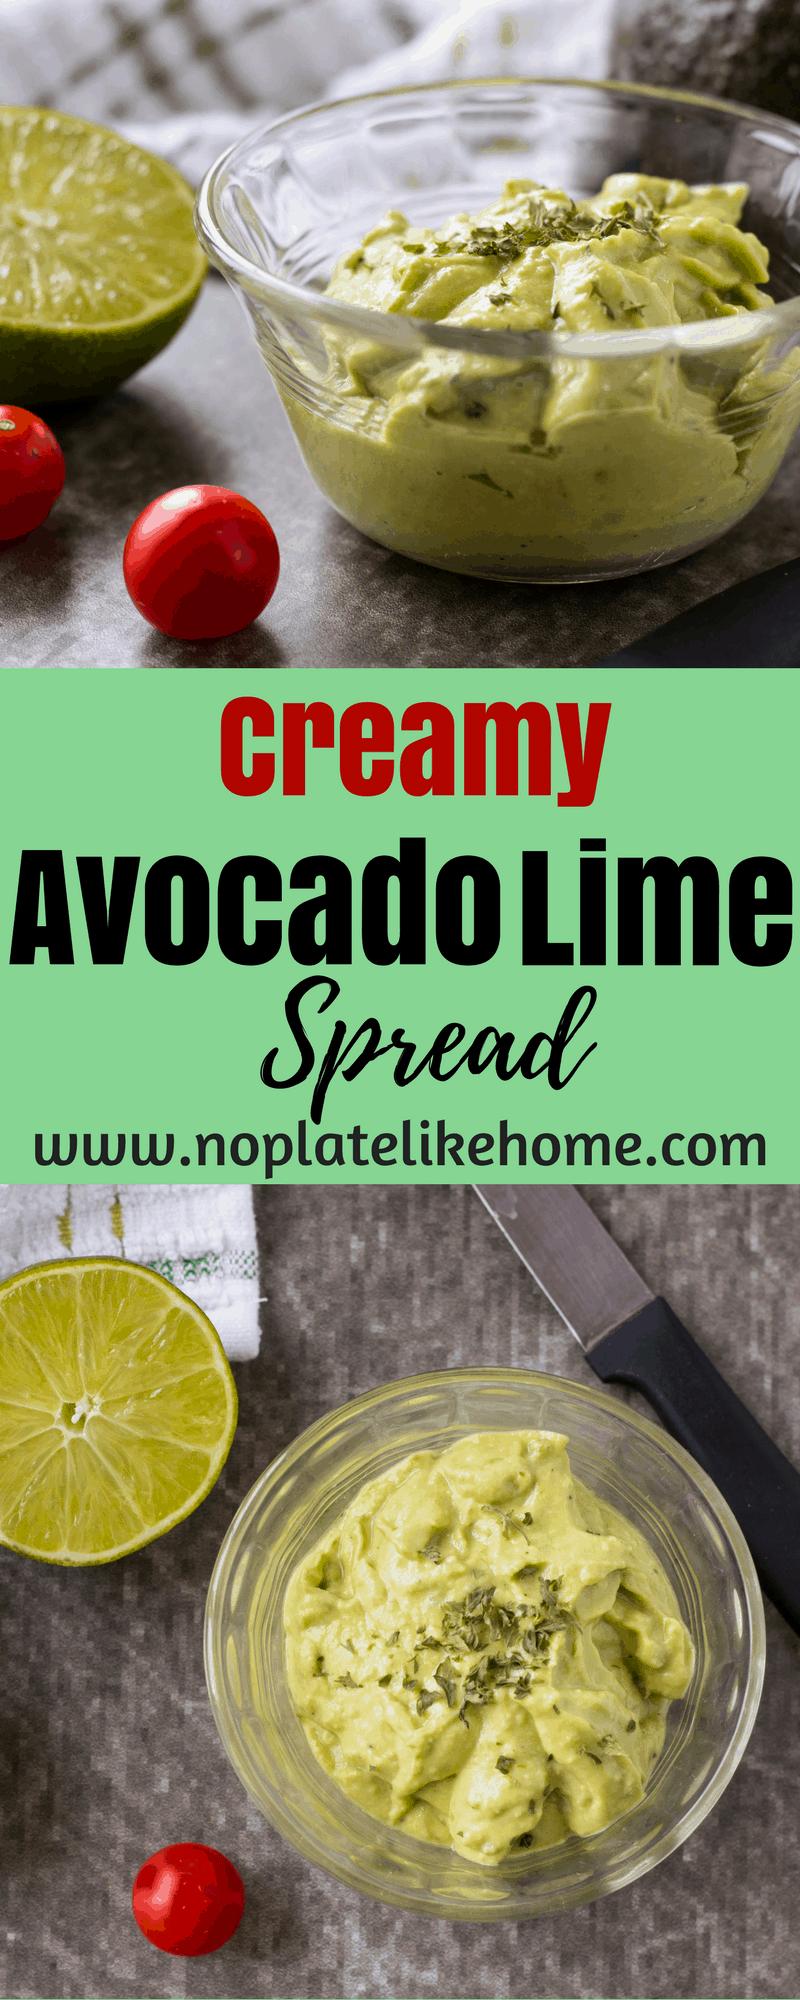 Easy Creamy Avocado Lime Spread in 3 Min!